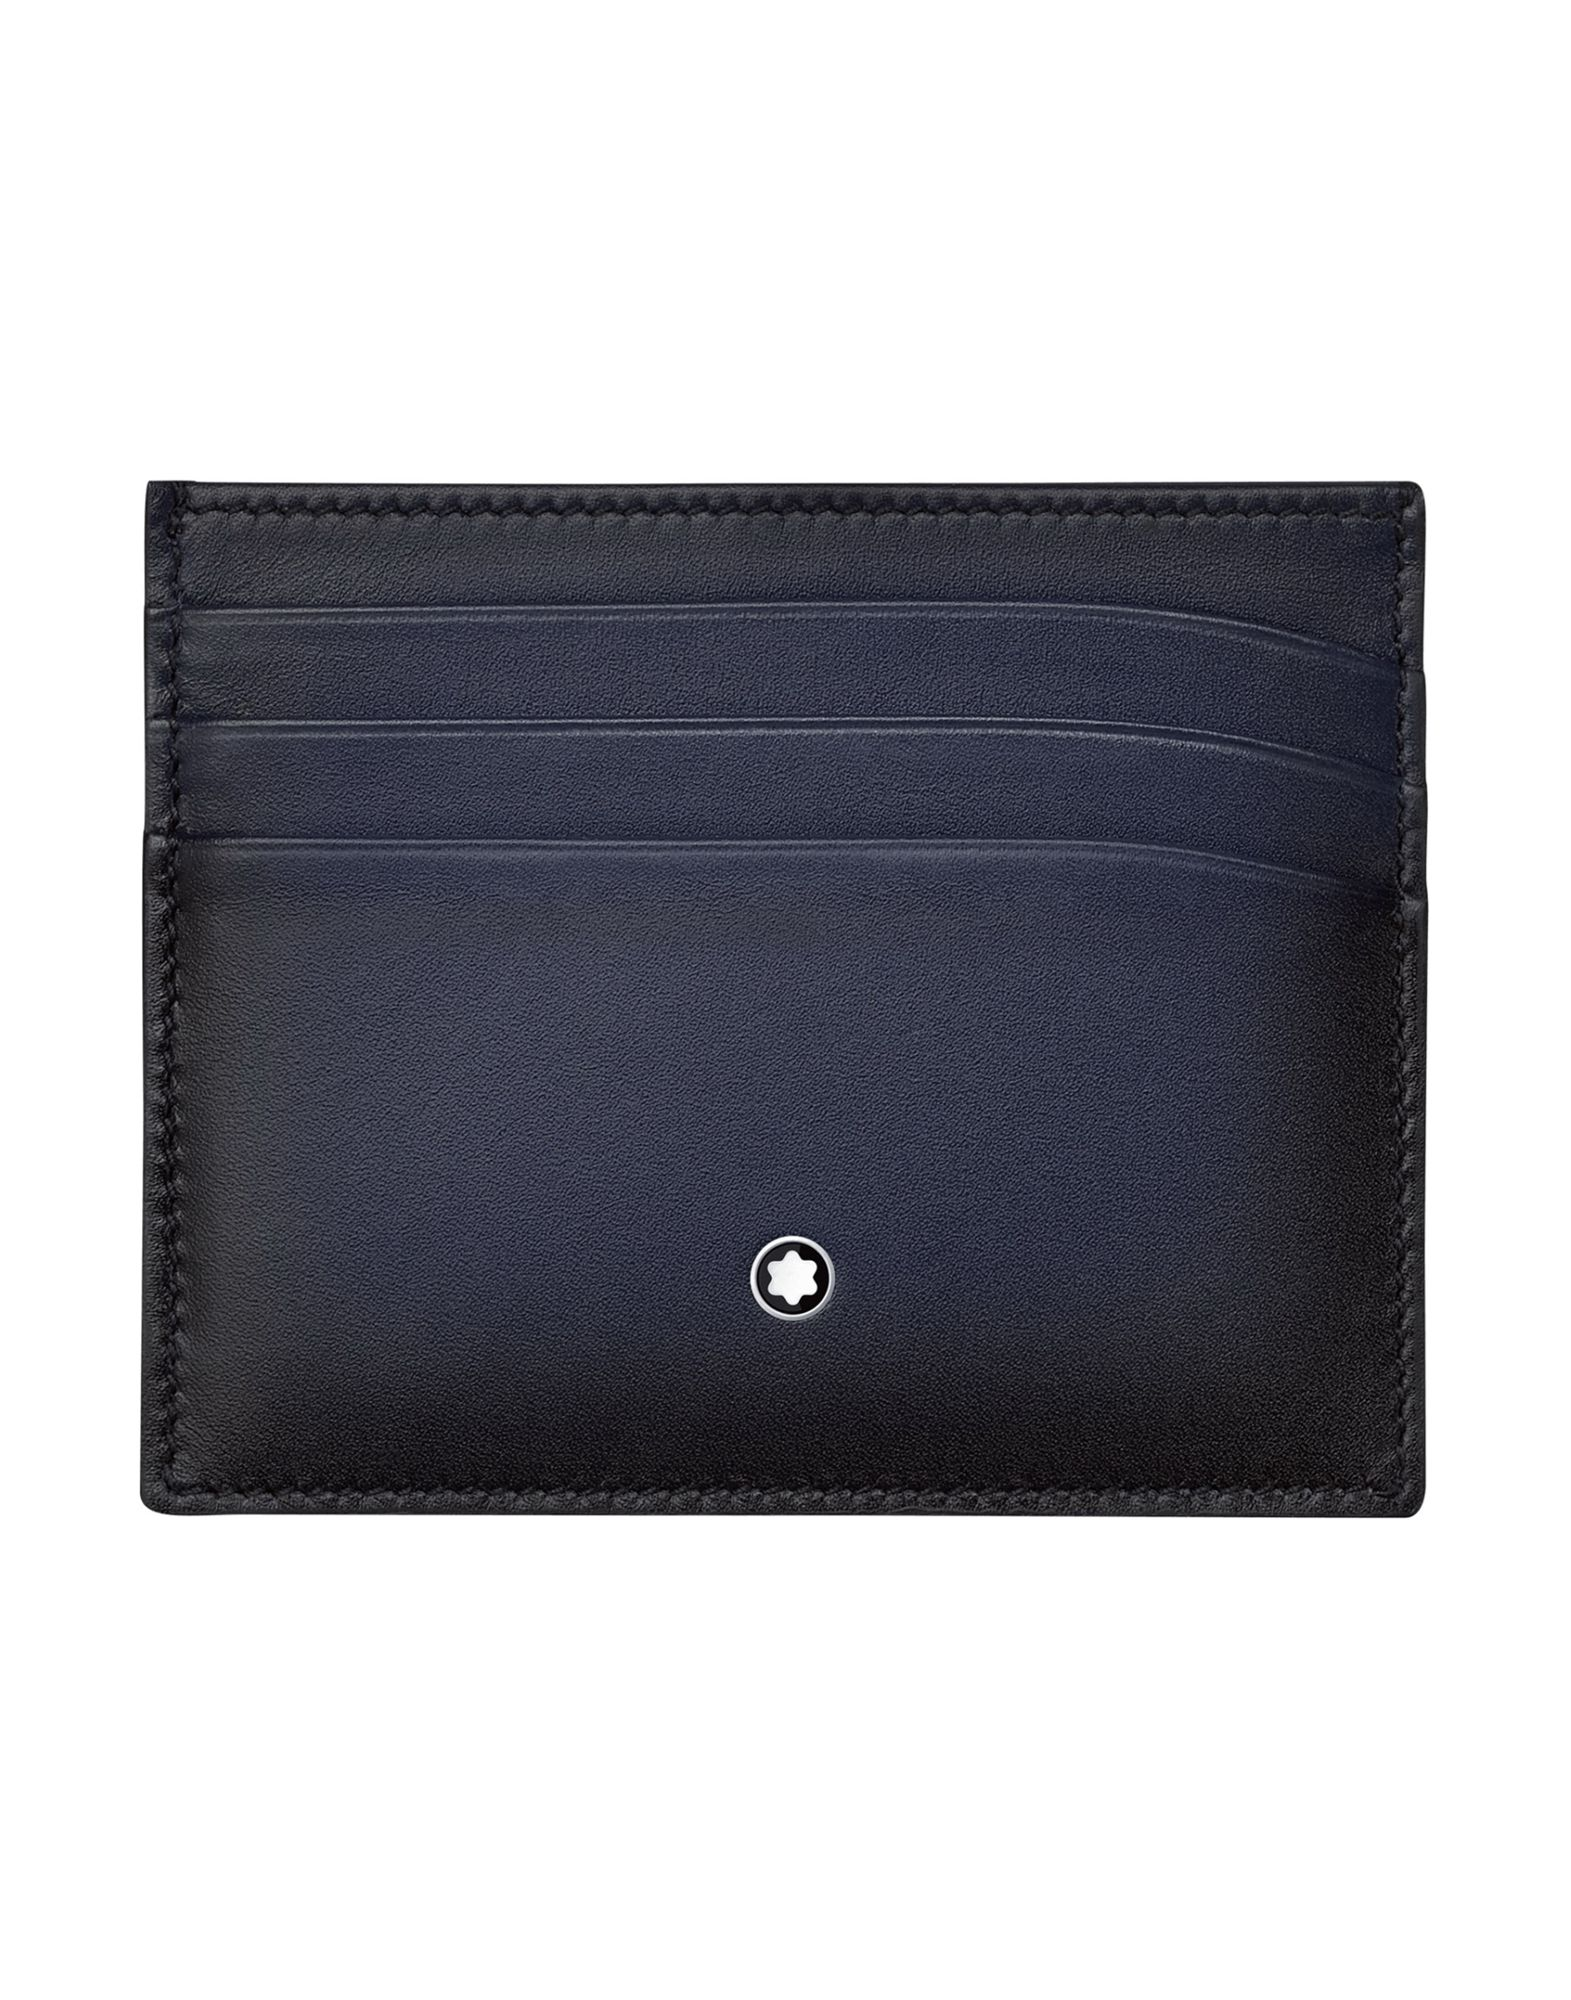 Portadocumenti Montblanc Pocket Holder 6Cc - Uomo - Acquista online su